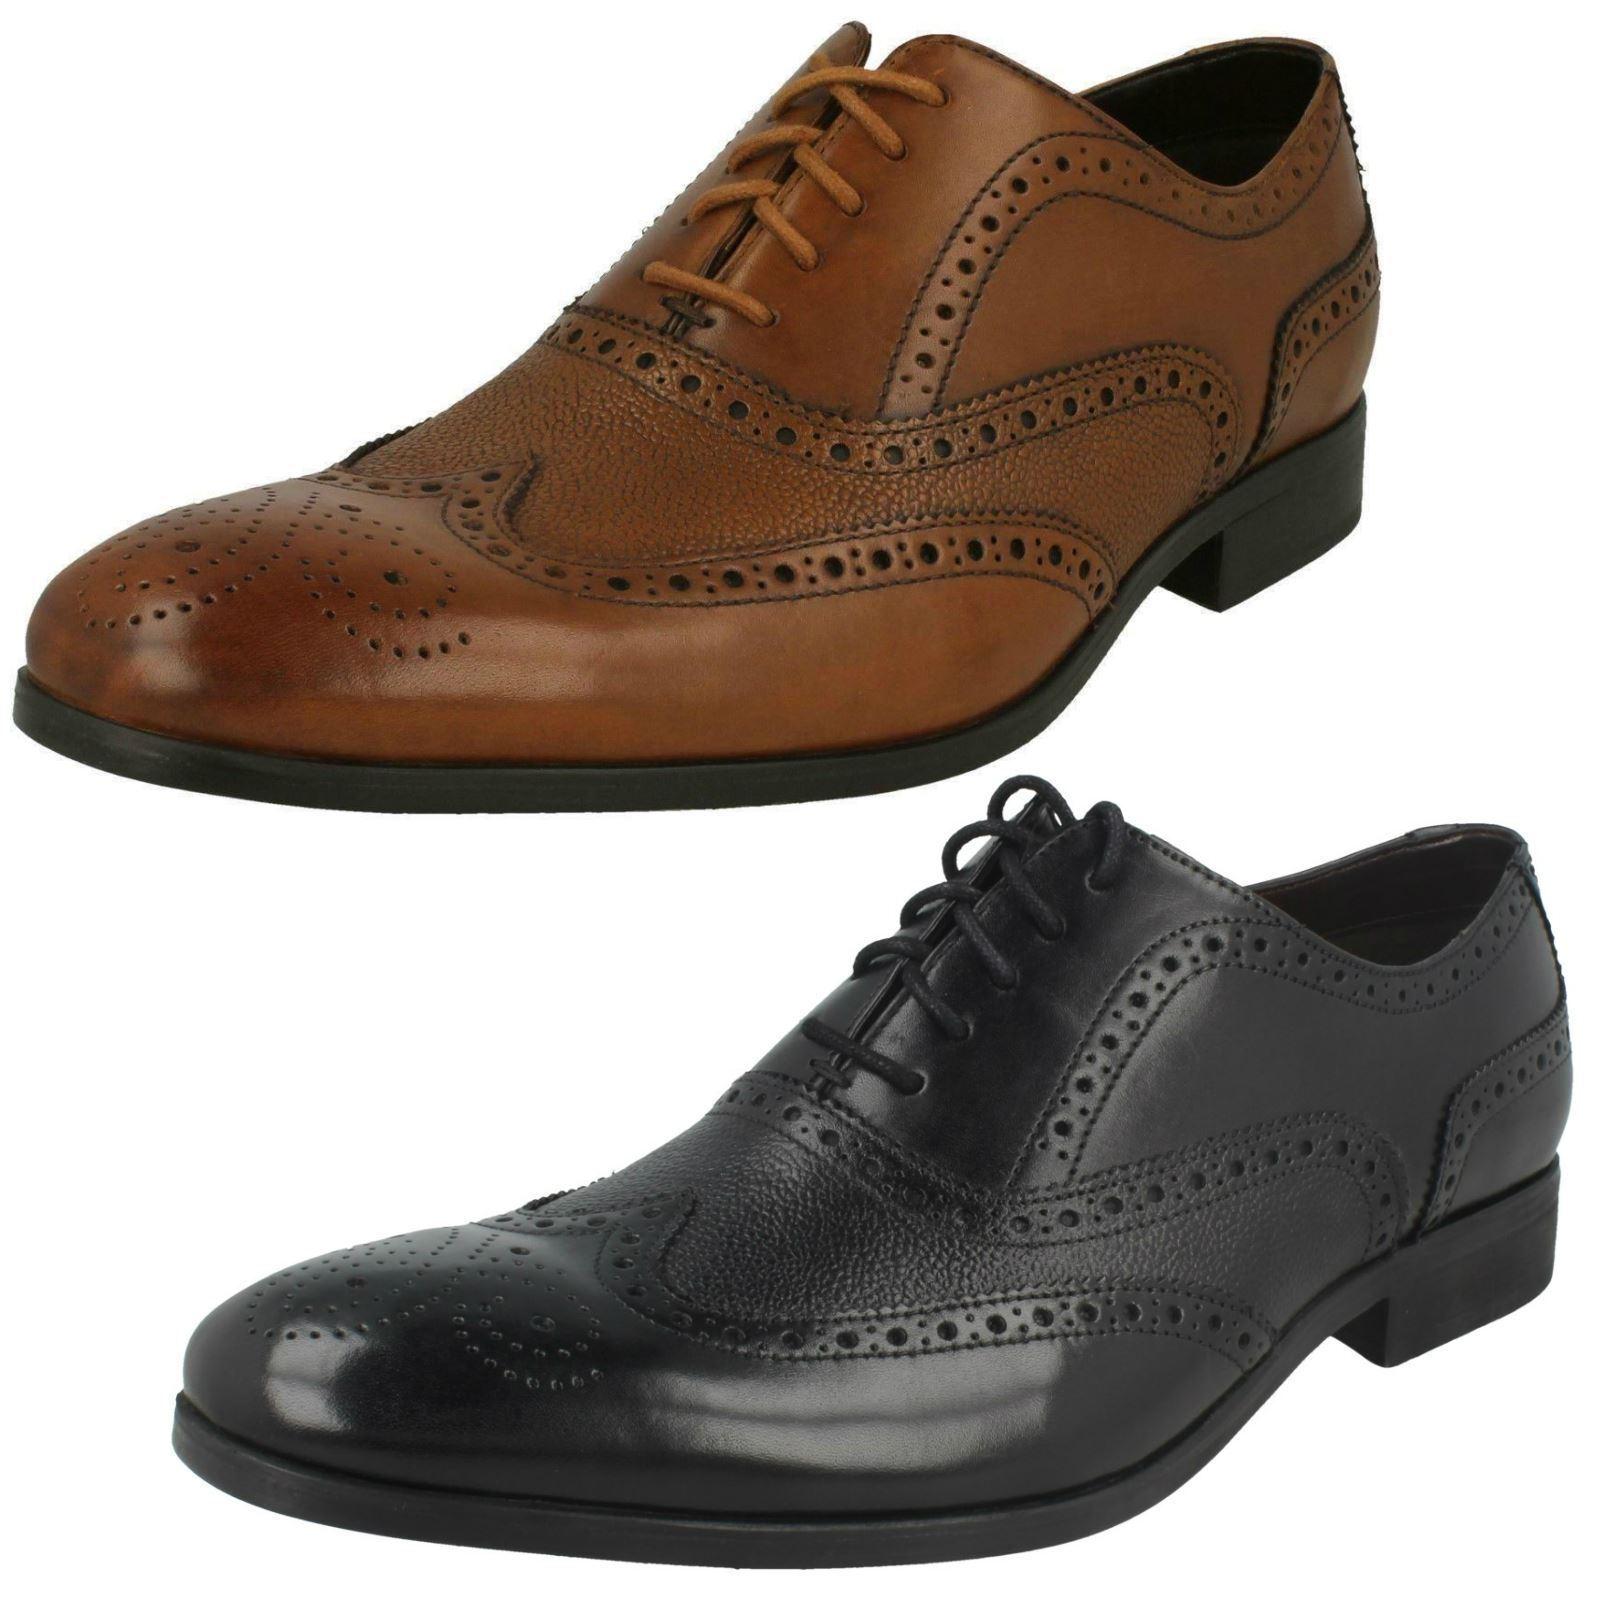 Mens Clarks Lace Up Stylish Grain Detail Leather Brogue shoes Gilmore Limit